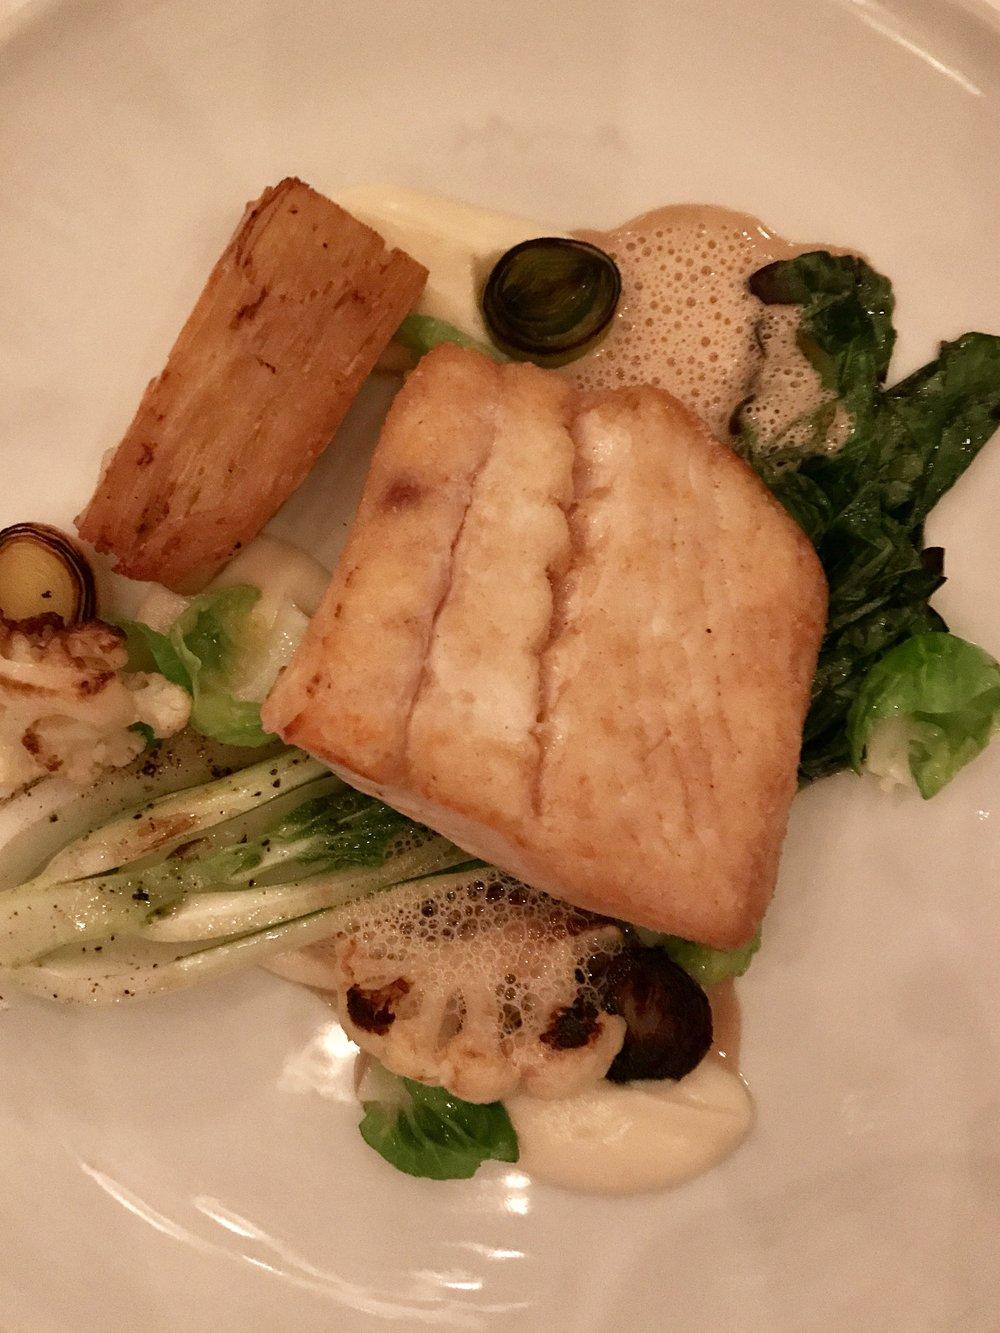 cod main dish st. john's newfoundland raymonds restaurant menu